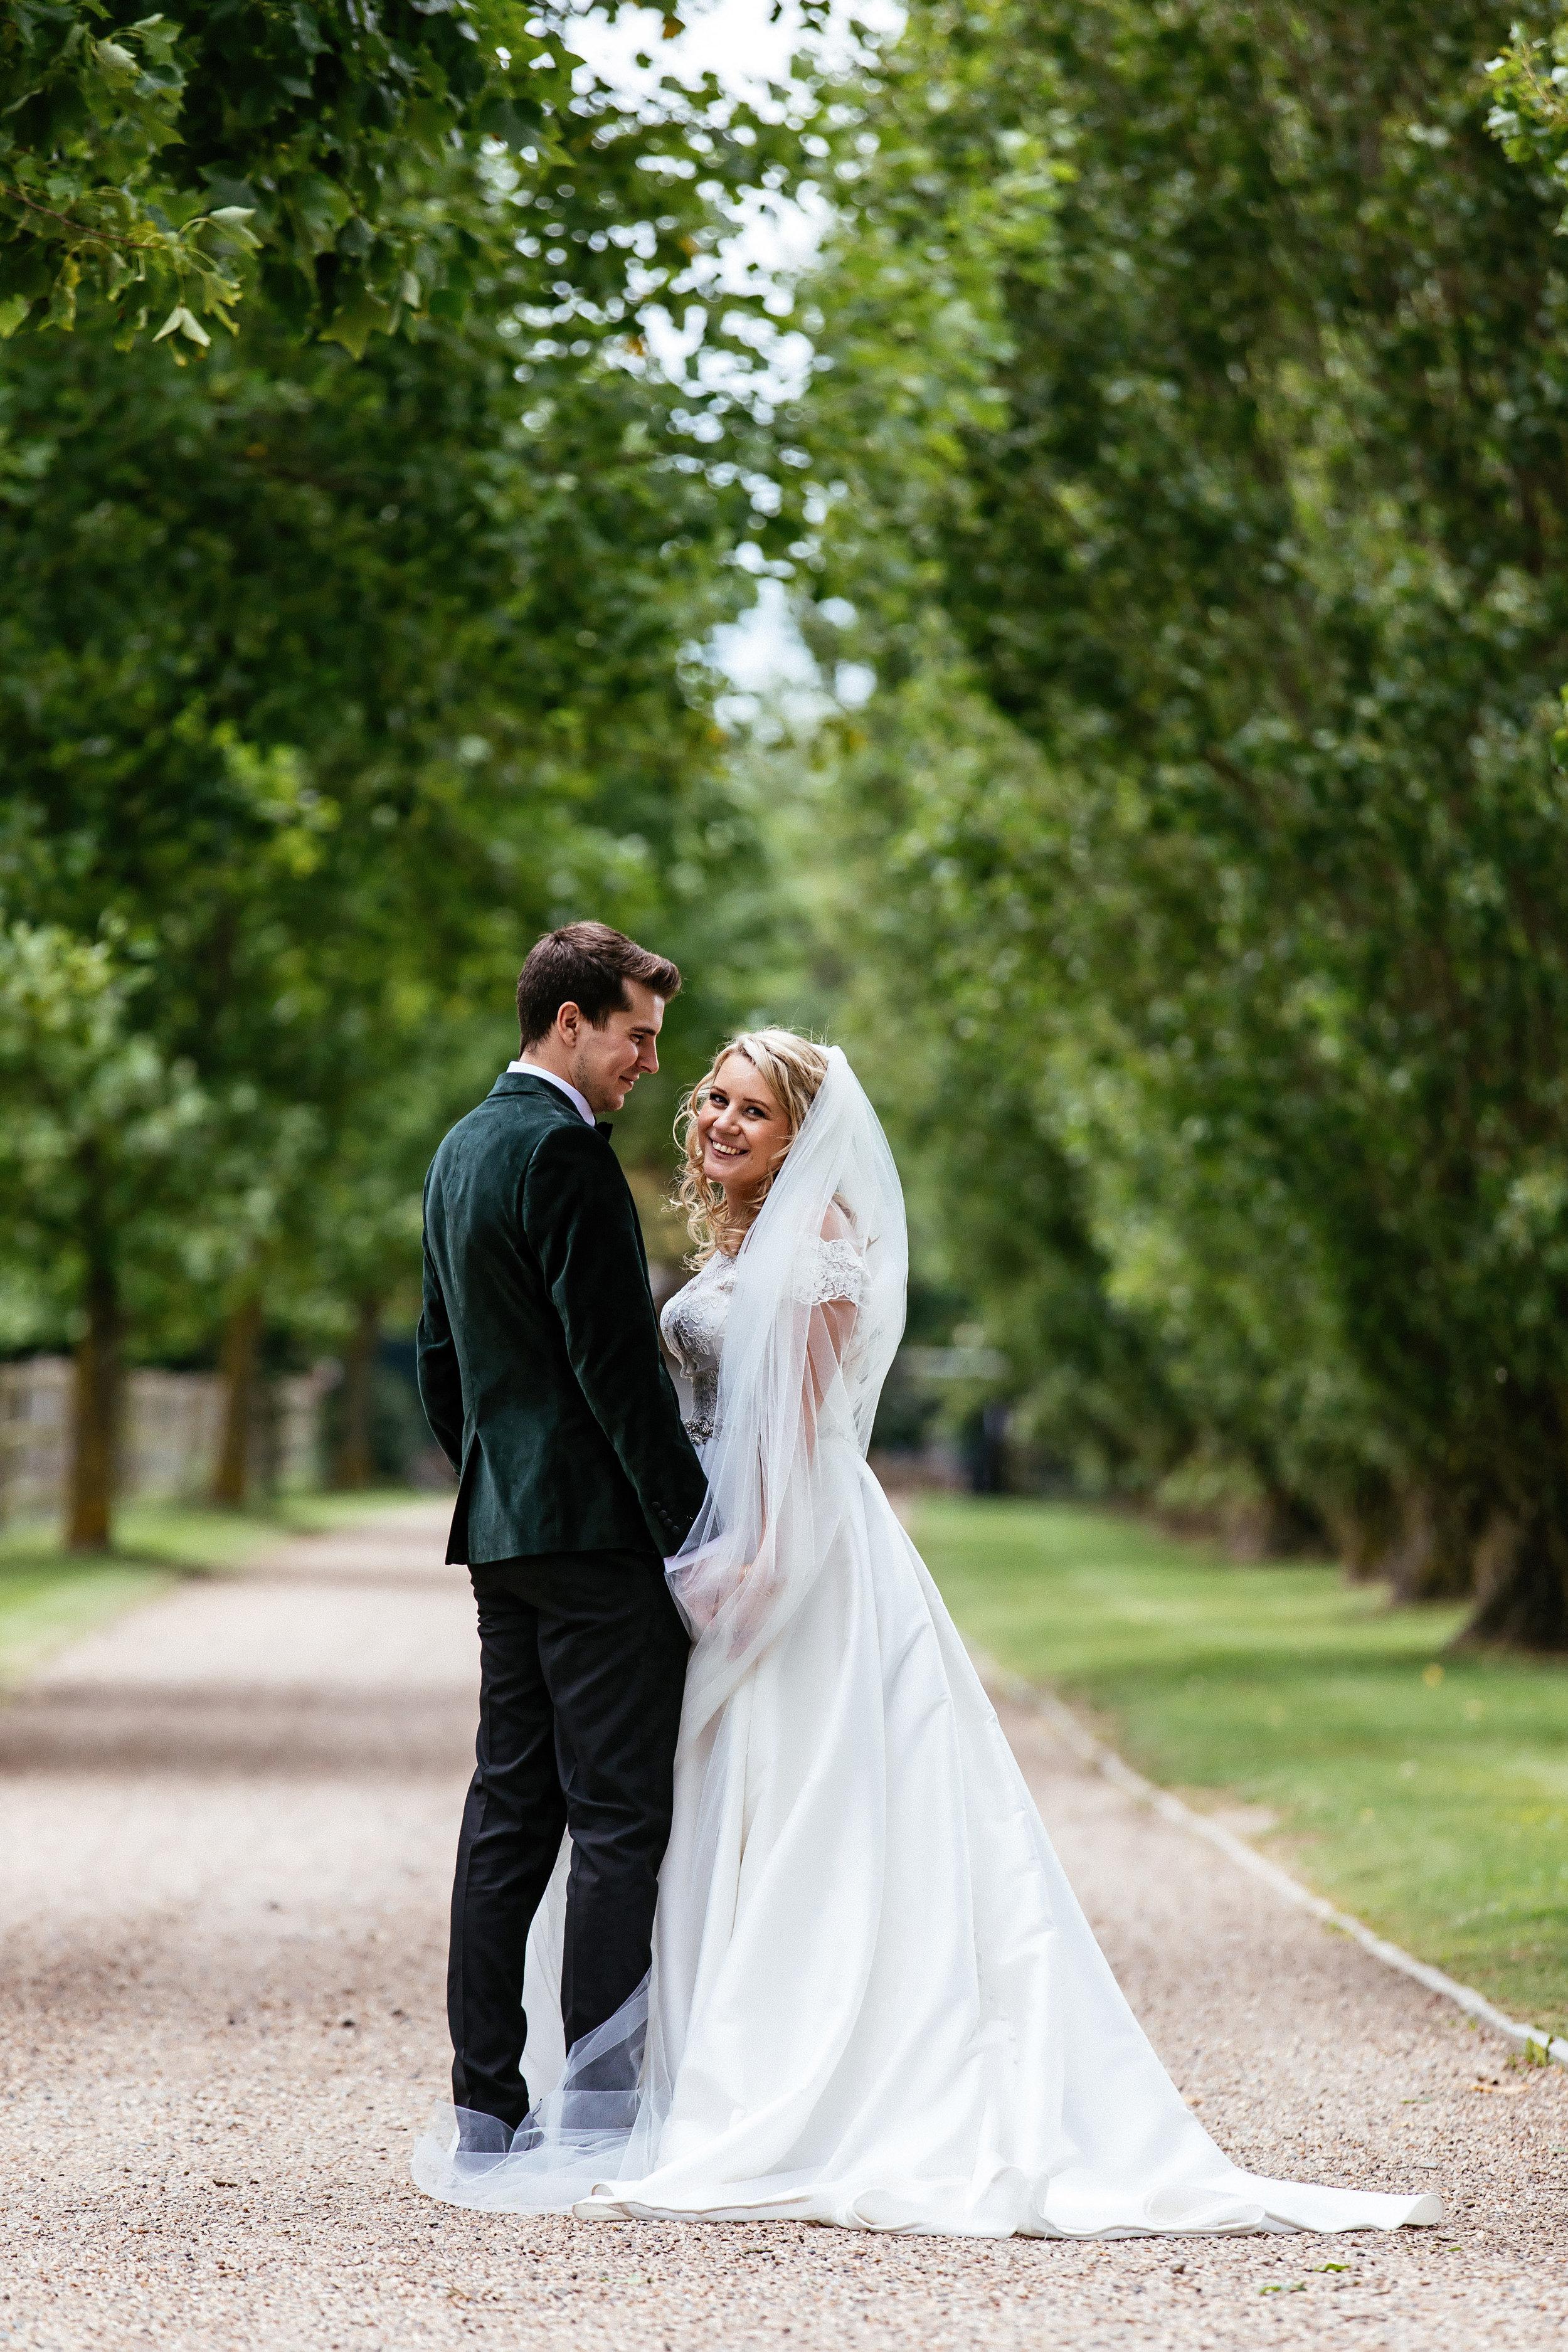 Tamara-and-Richard-Wedding-Highlights-53.jpg